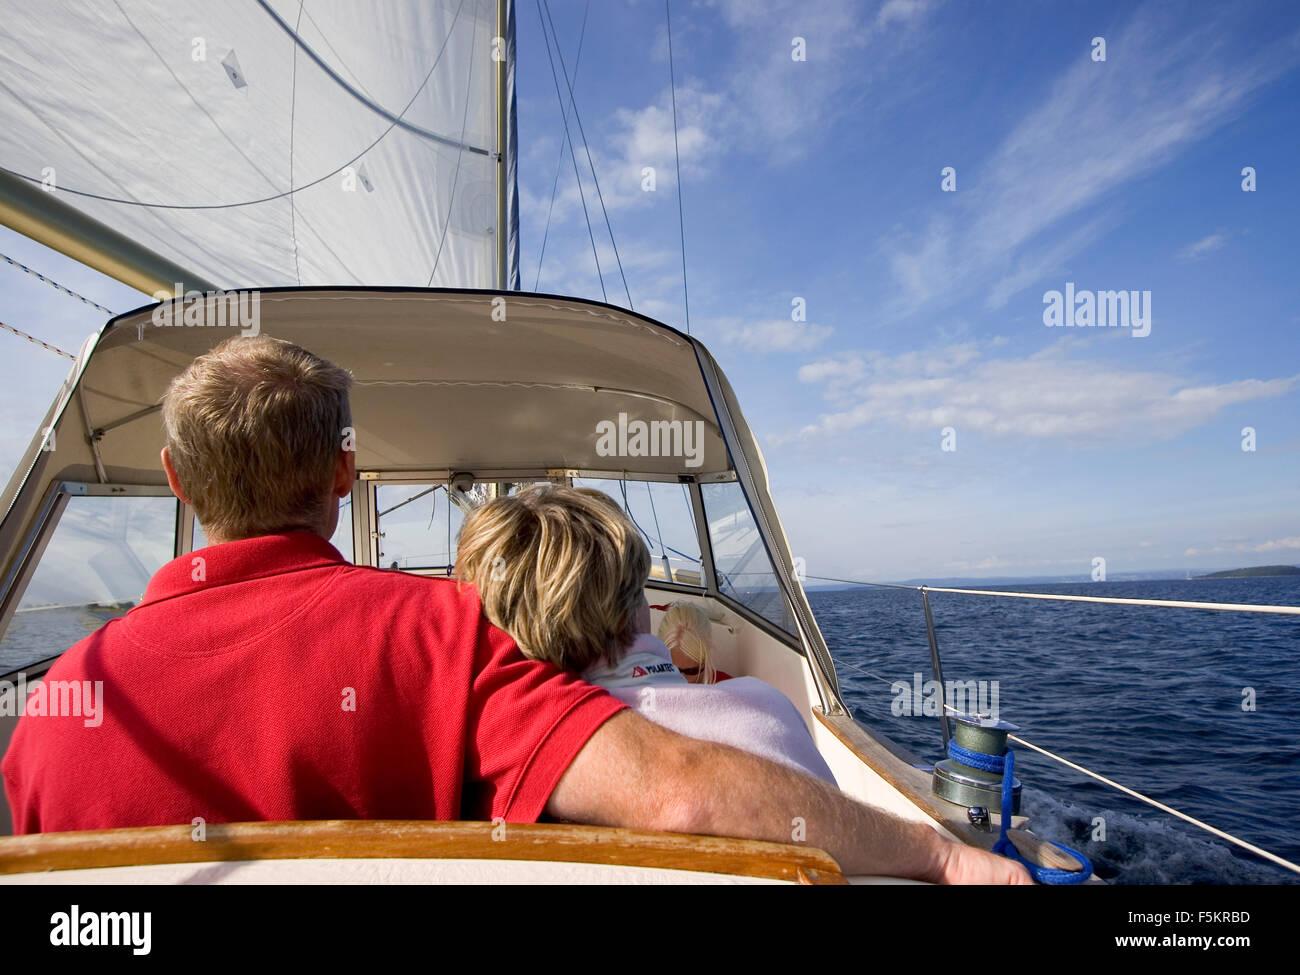 Sweden, Bohuslan, Reare view of sailing couple - Stock Image